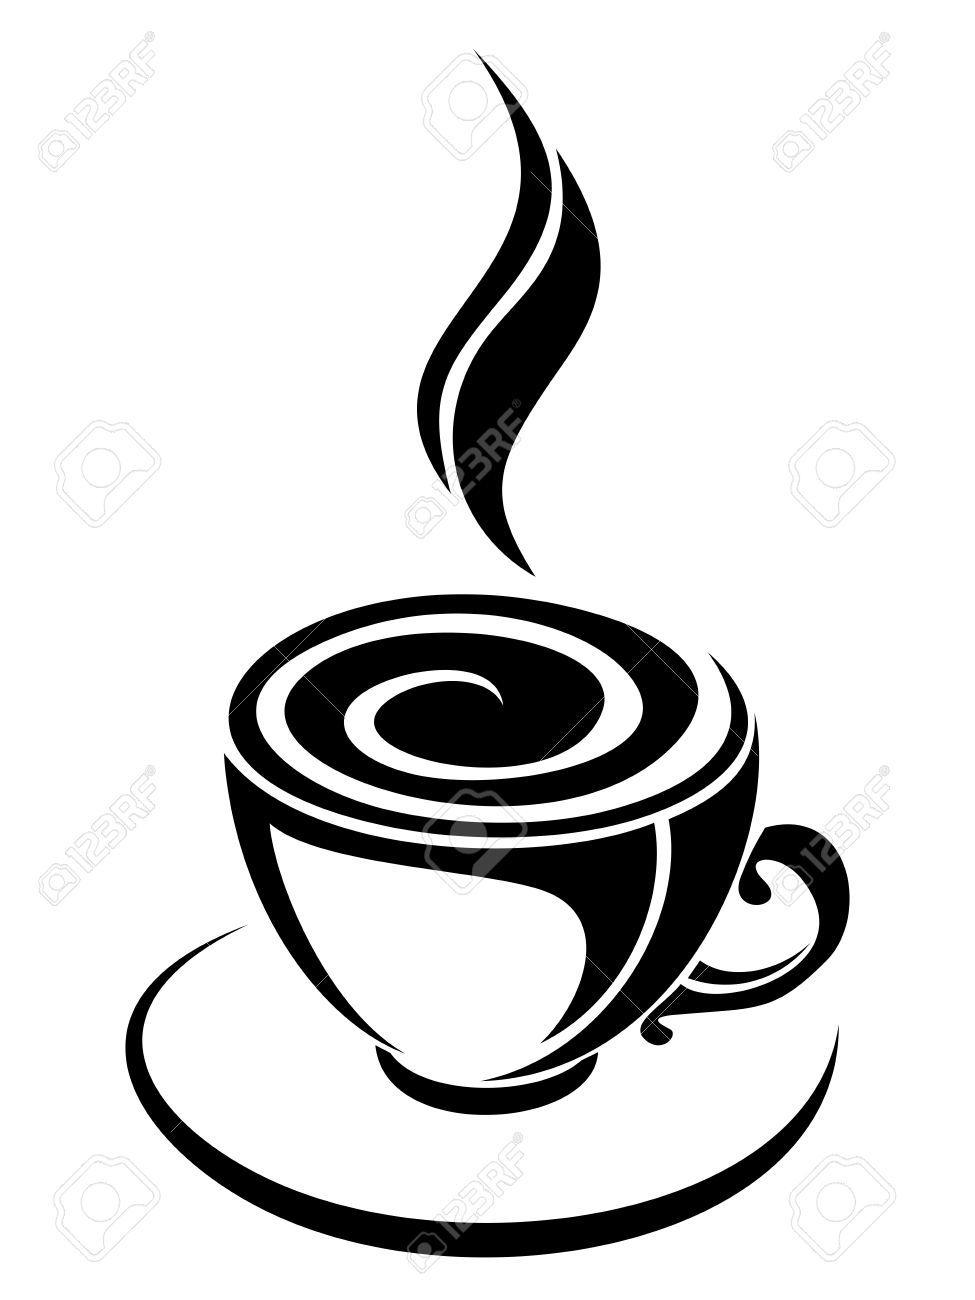 Espresso cup clipart clip coffee silhouette | Project Lab | Tribal tattoos, Coffee, Pencil ... clip